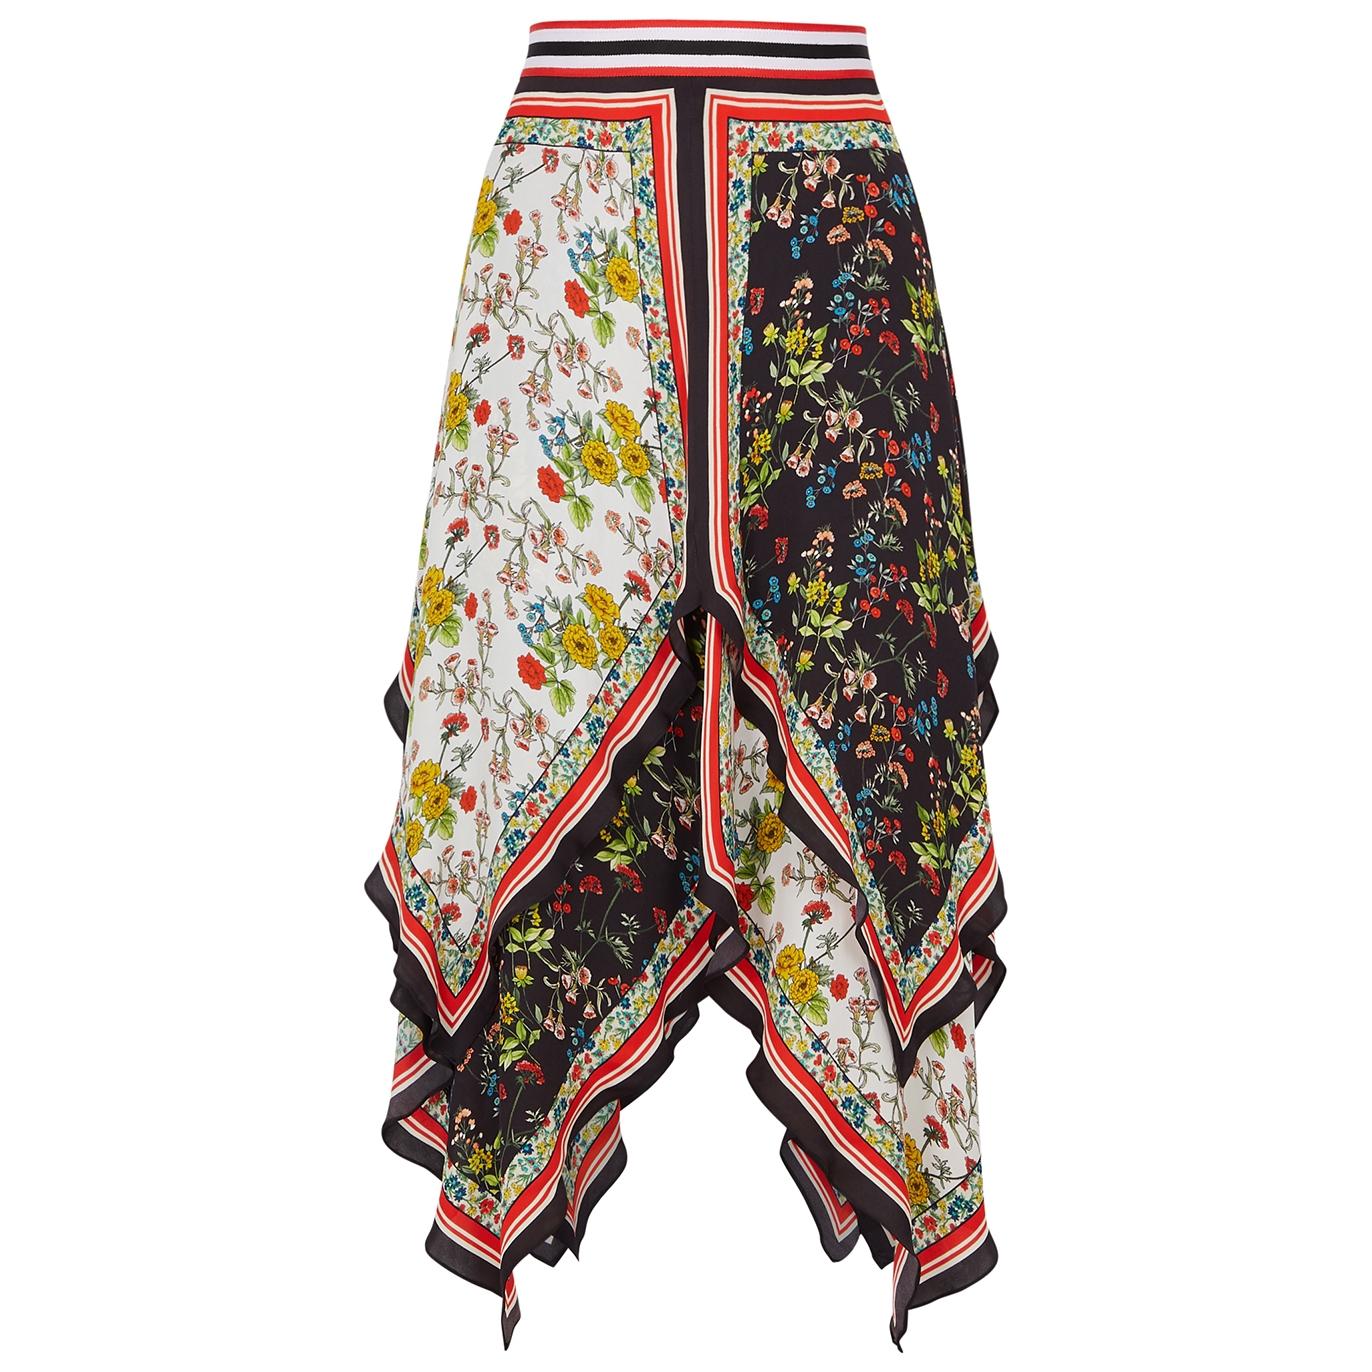 373036a6344 Alice + Olivia Maura printed asymmetric satin skirt - Harvey Nichols